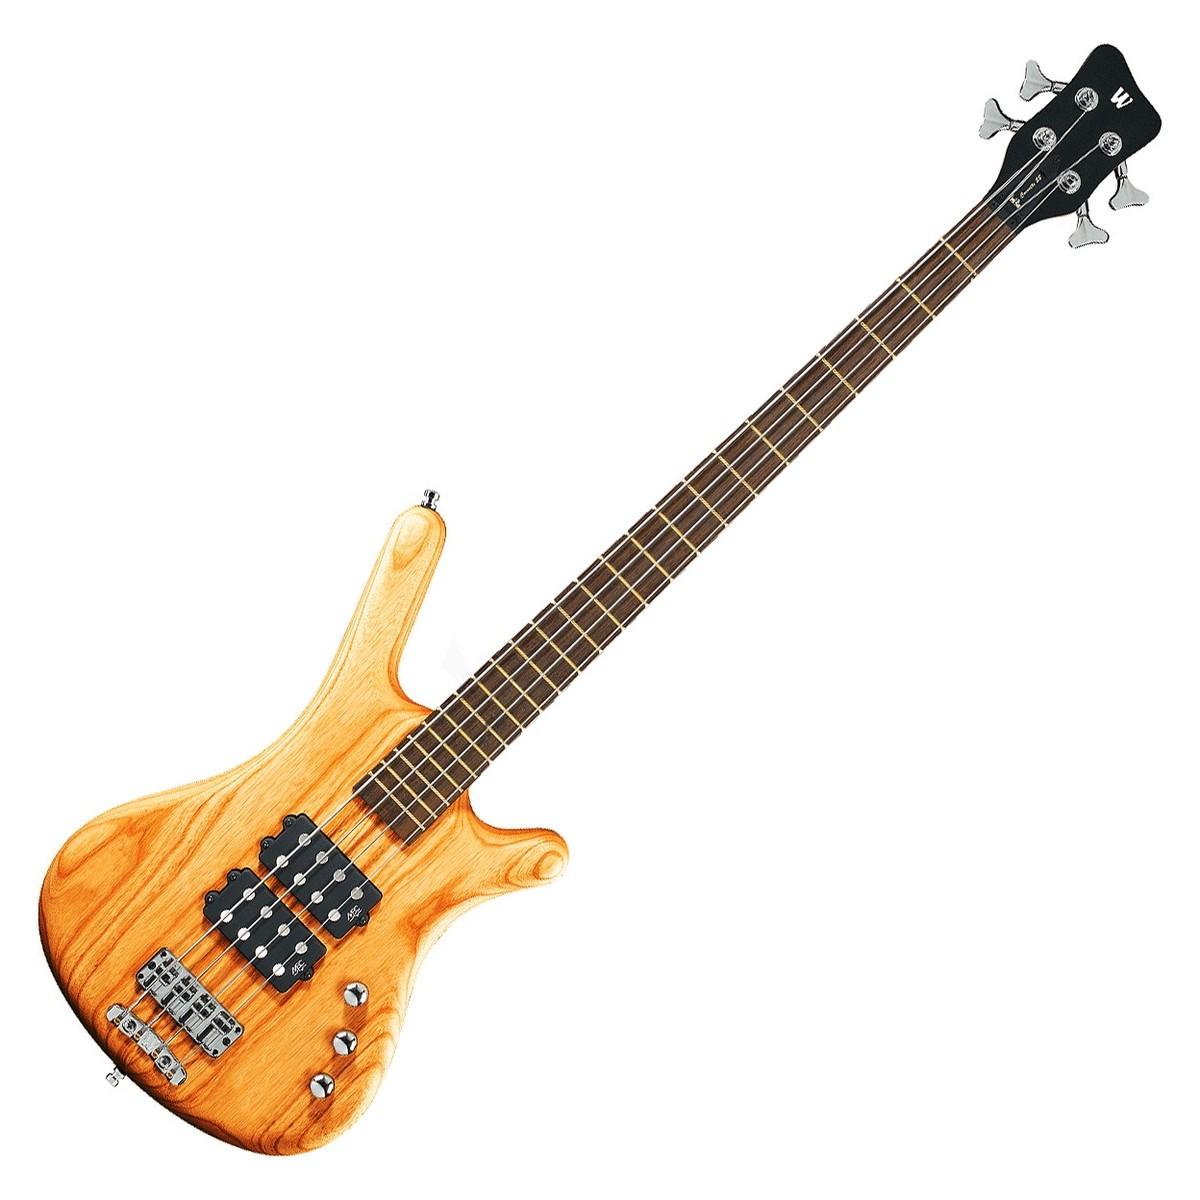 warwick rockbass corvette 4 string bass guitar honey violin at. Black Bedroom Furniture Sets. Home Design Ideas